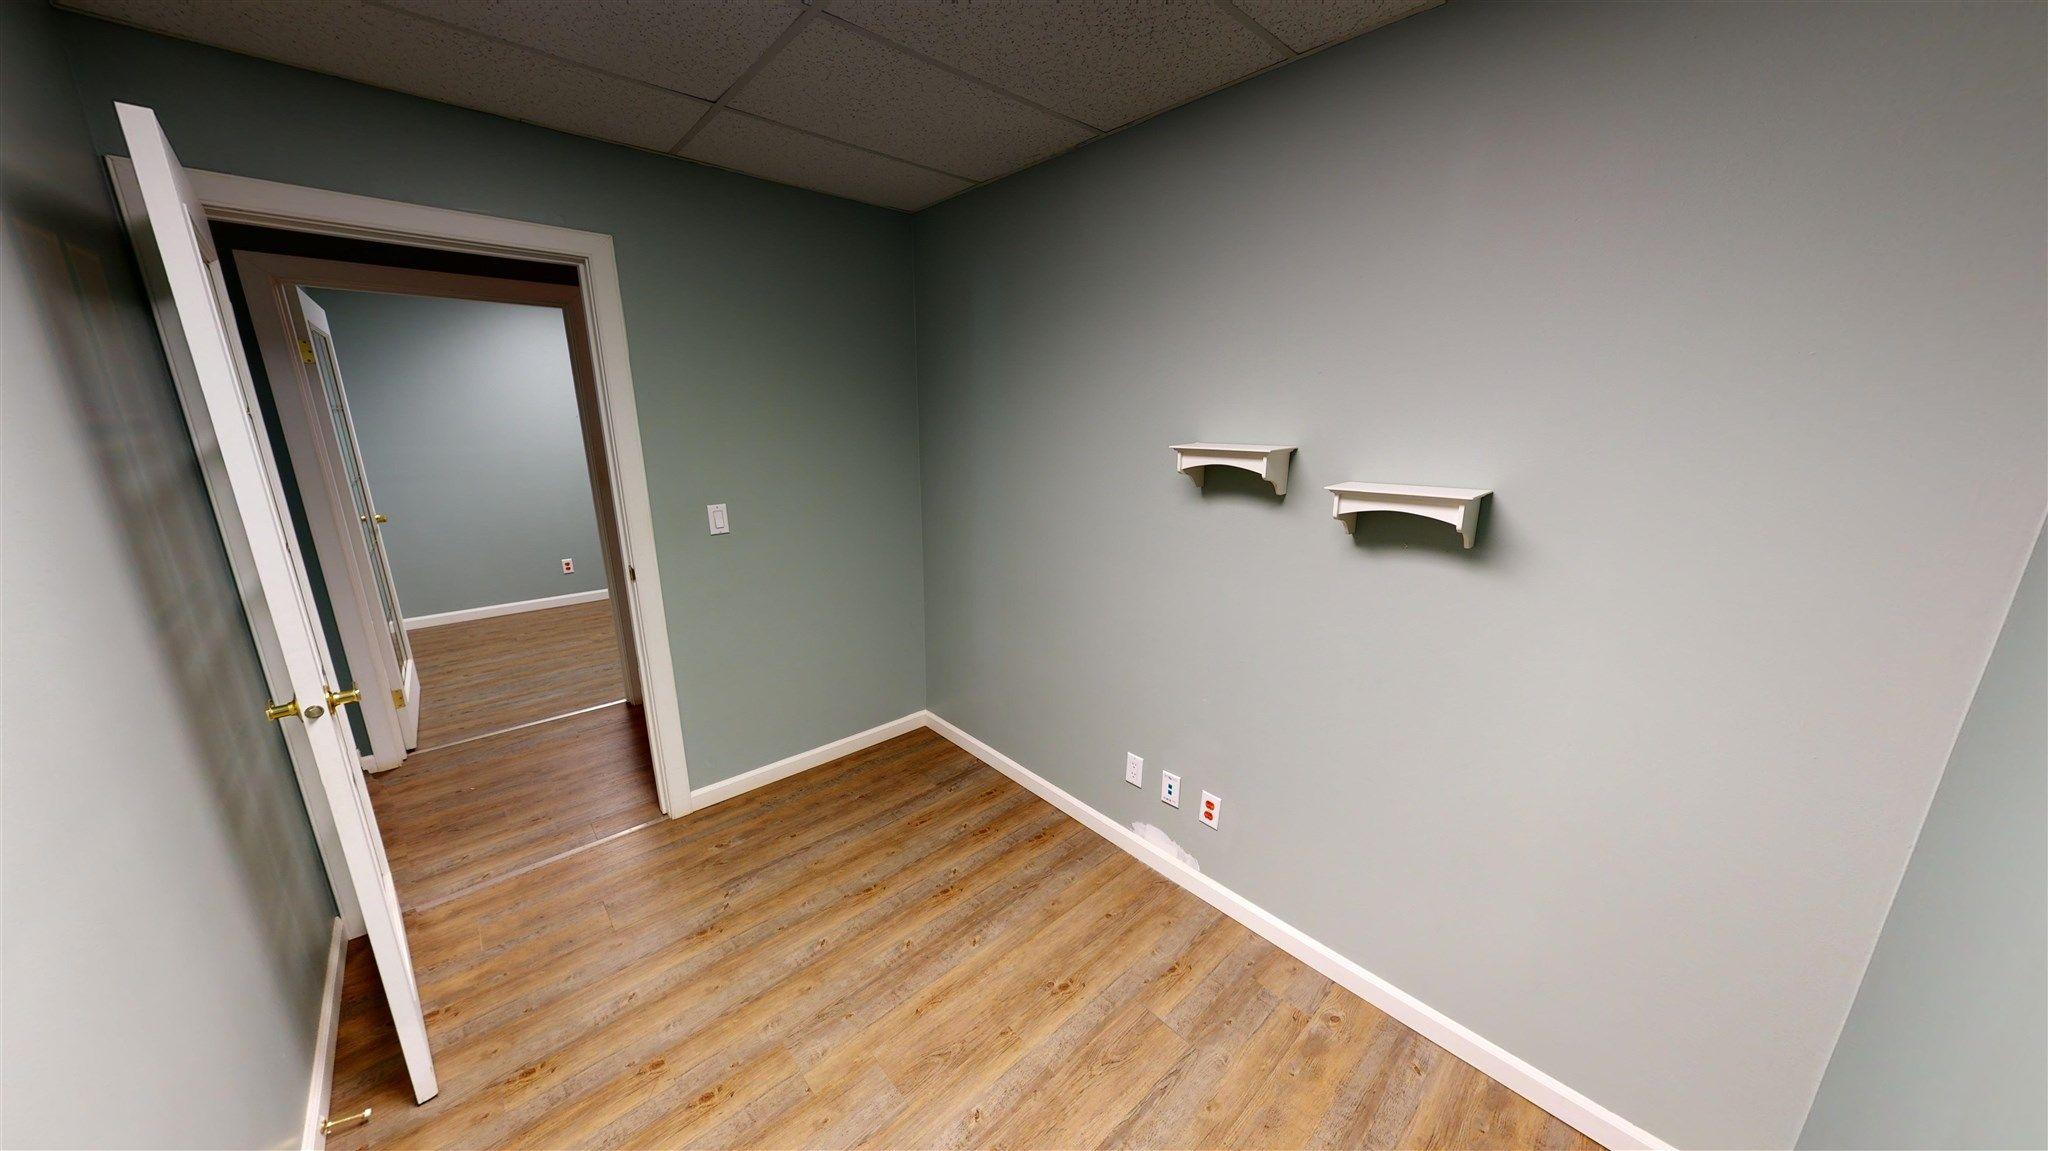 Photo 13: Photos: 10067 100 Avenue in Fort St. John: Fort St. John - City NW Office for sale (Fort St. John (Zone 60))  : MLS®# C8039097